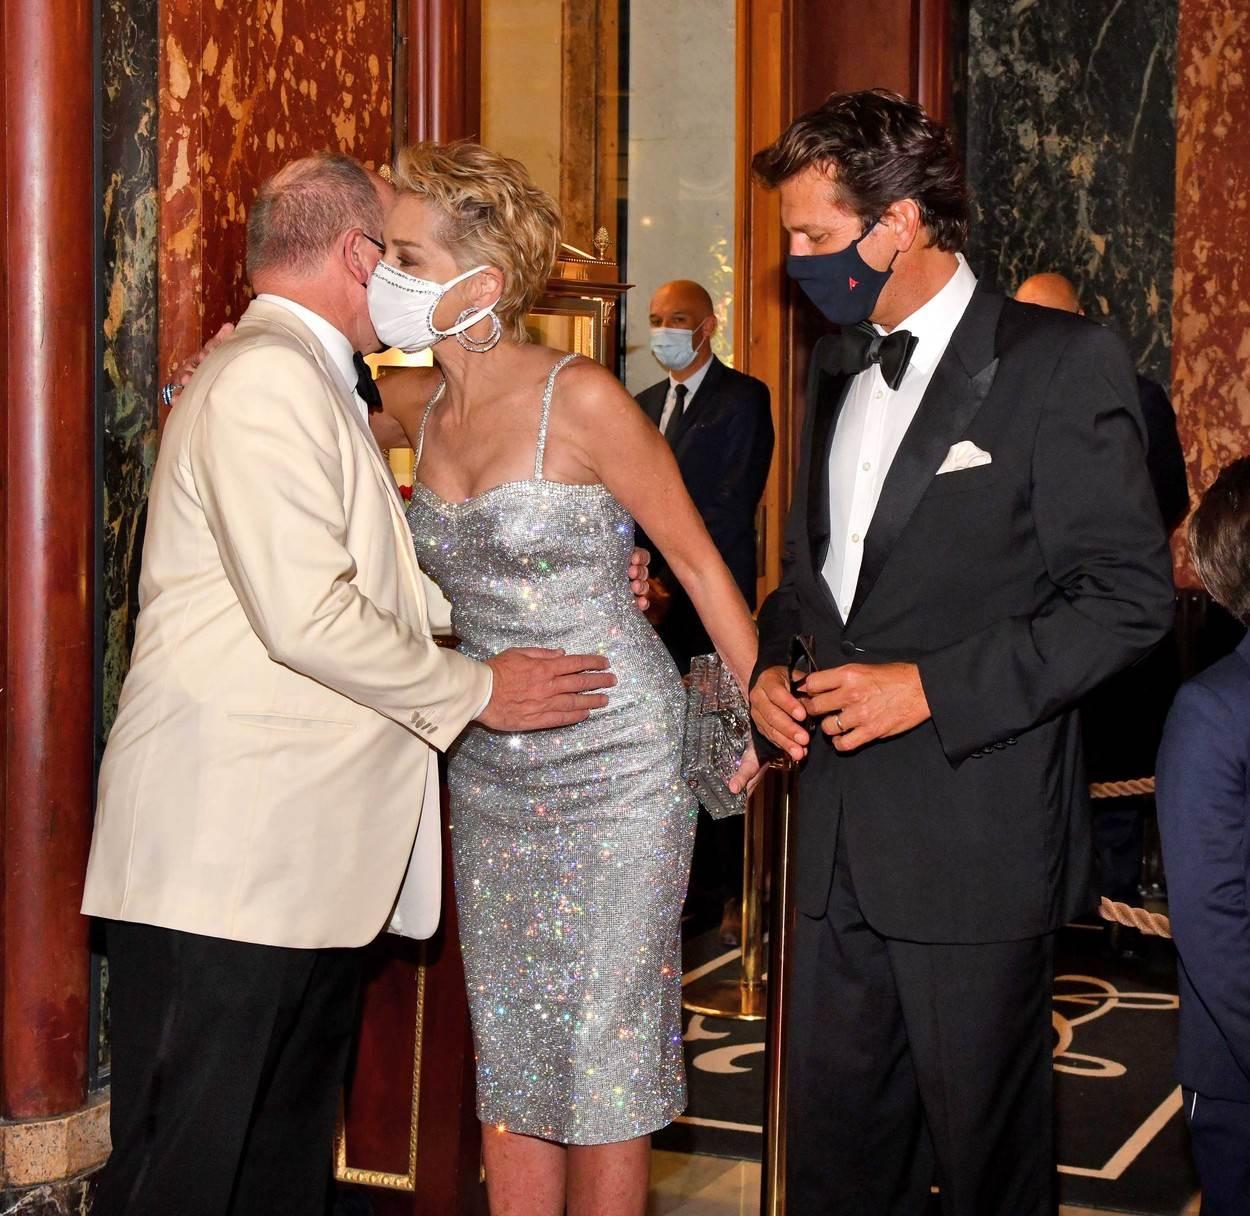 Sharon Stone i princ Albert II. - Profimedia